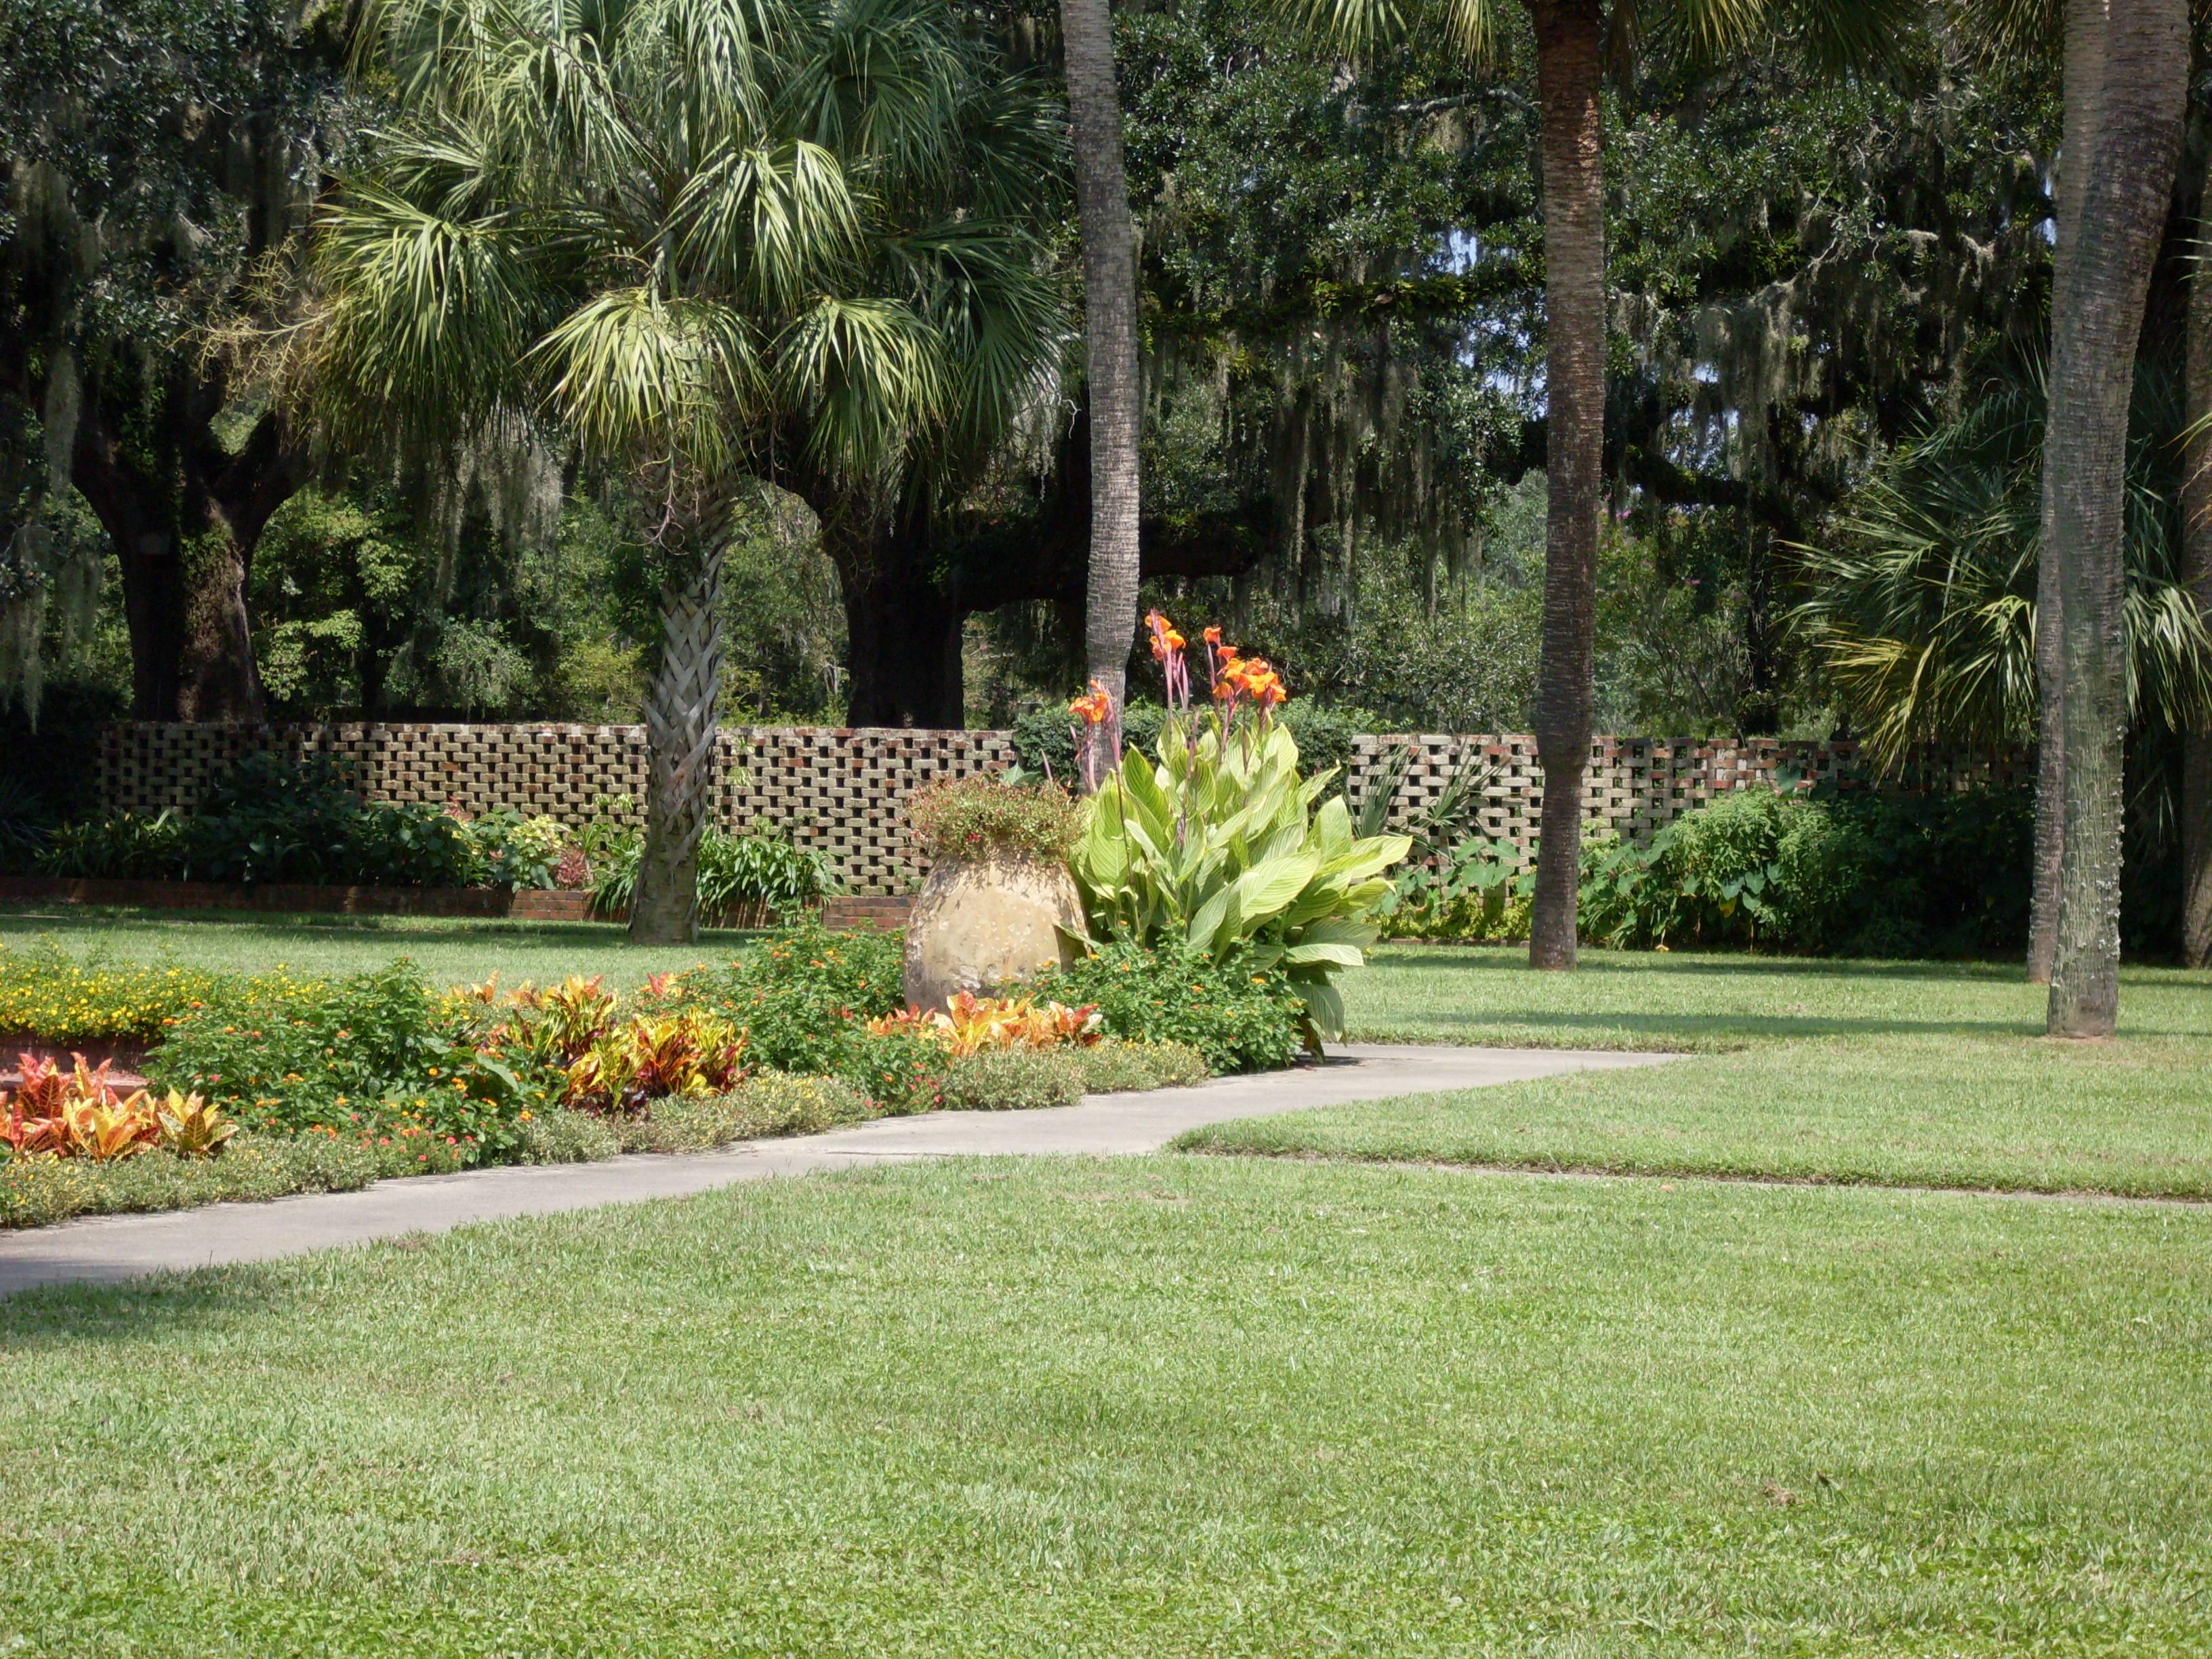 garden view - Garden View